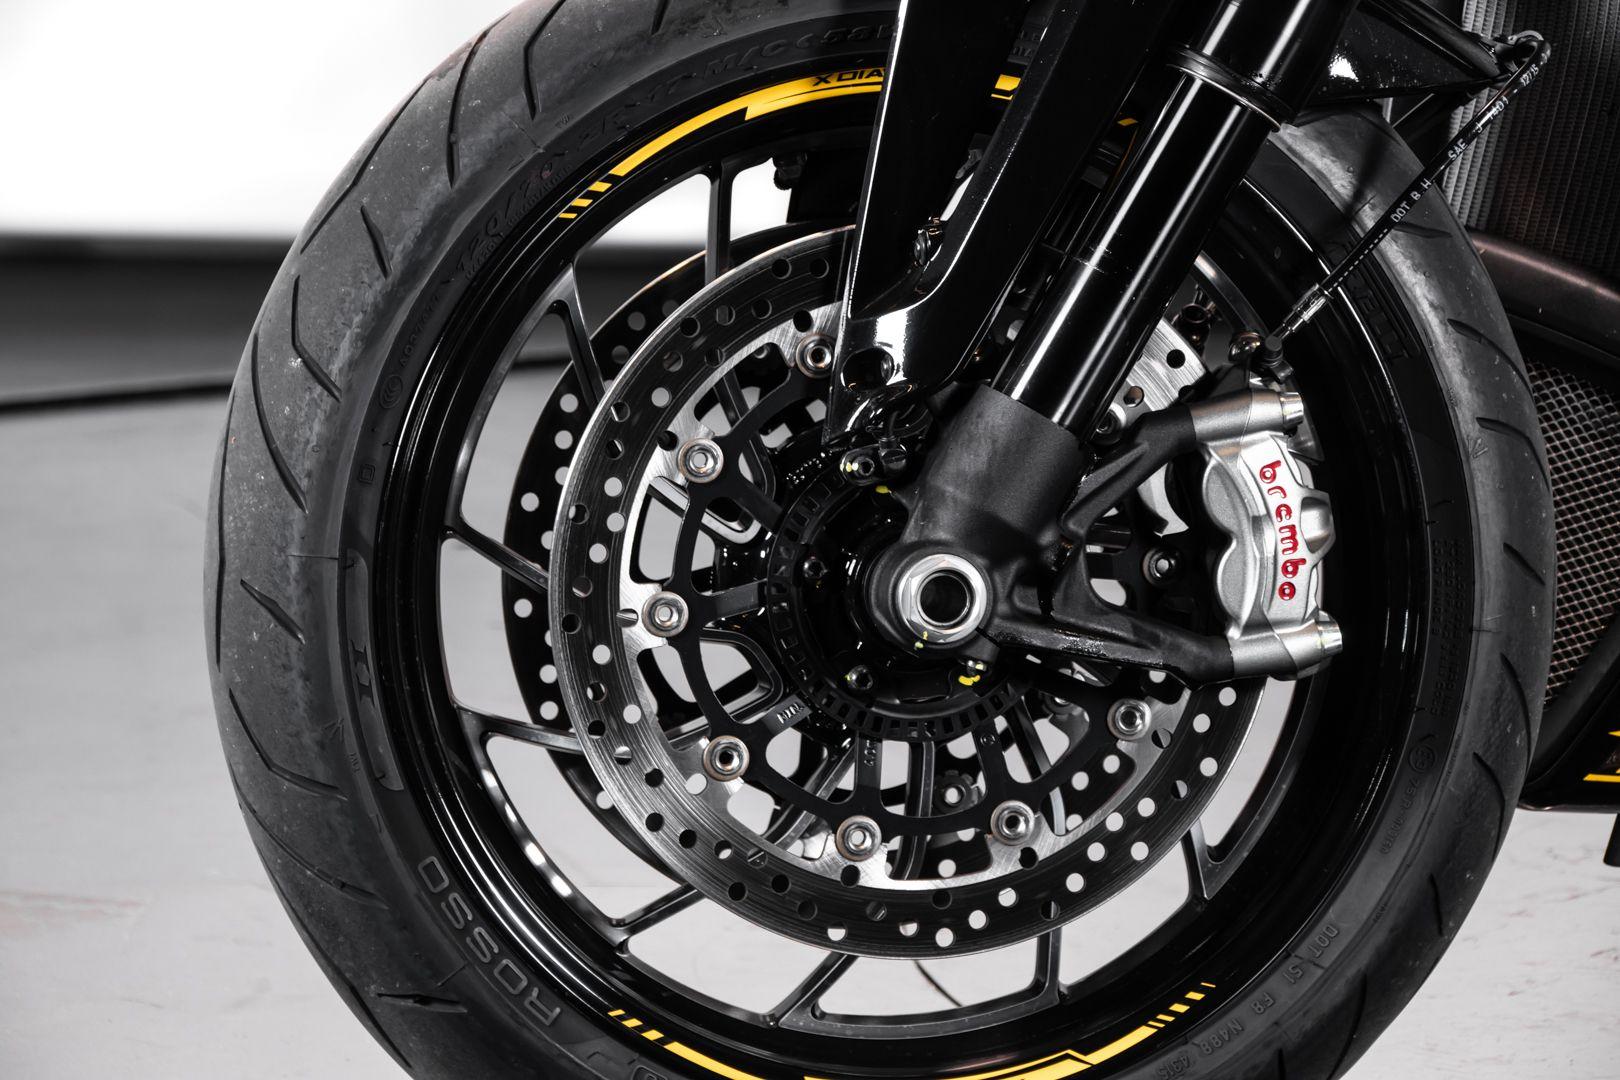 2016 Ducati X Diavel S 72371